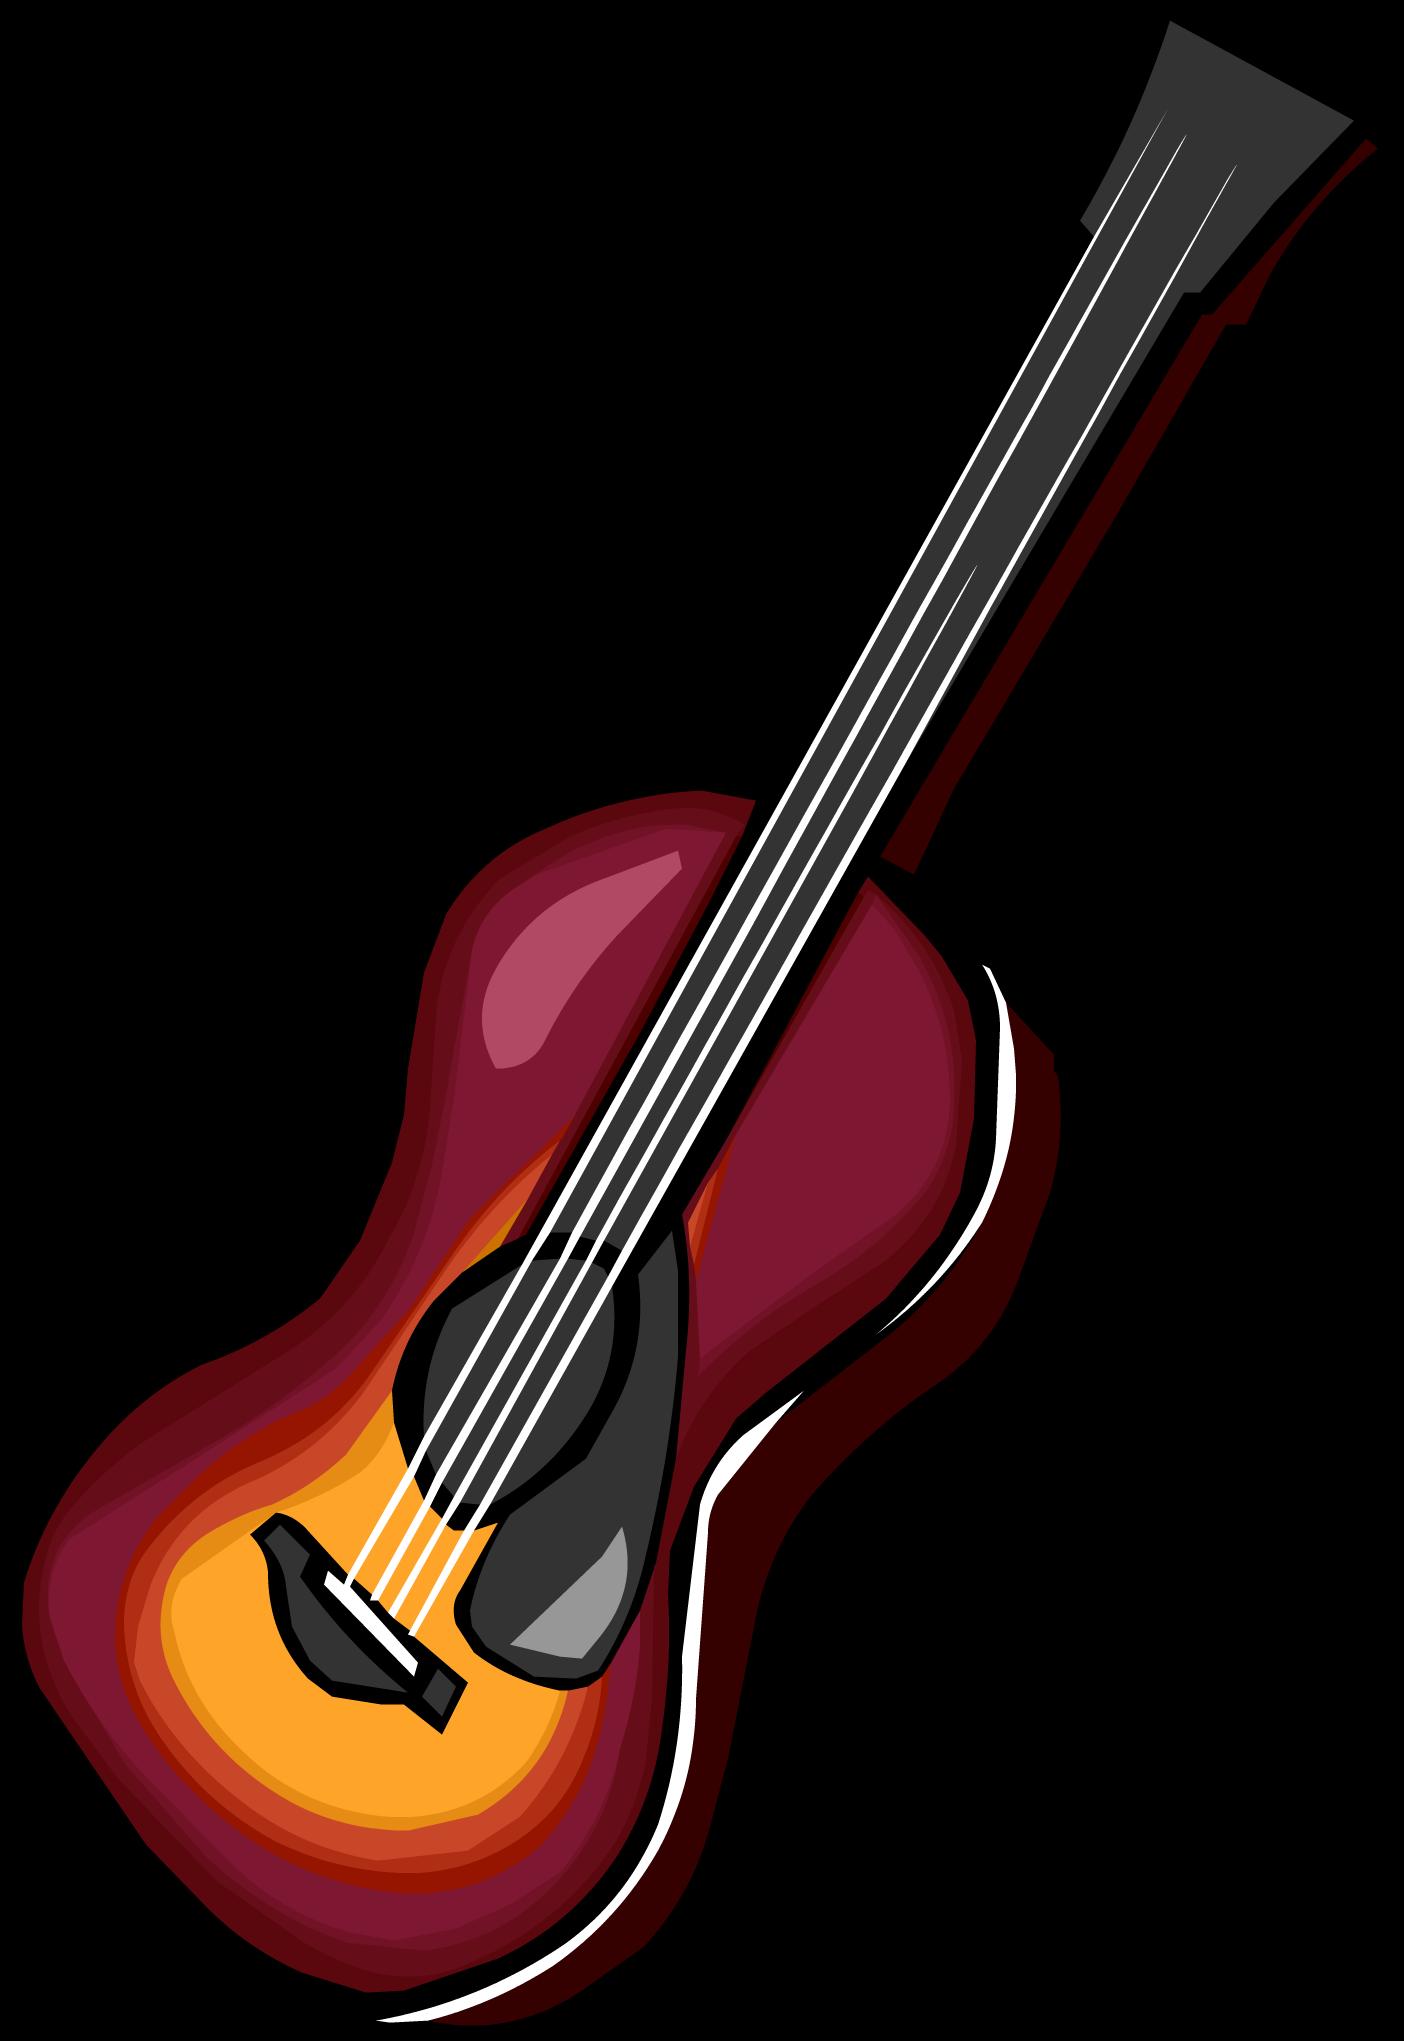 Acoustic Sunburst Guitar